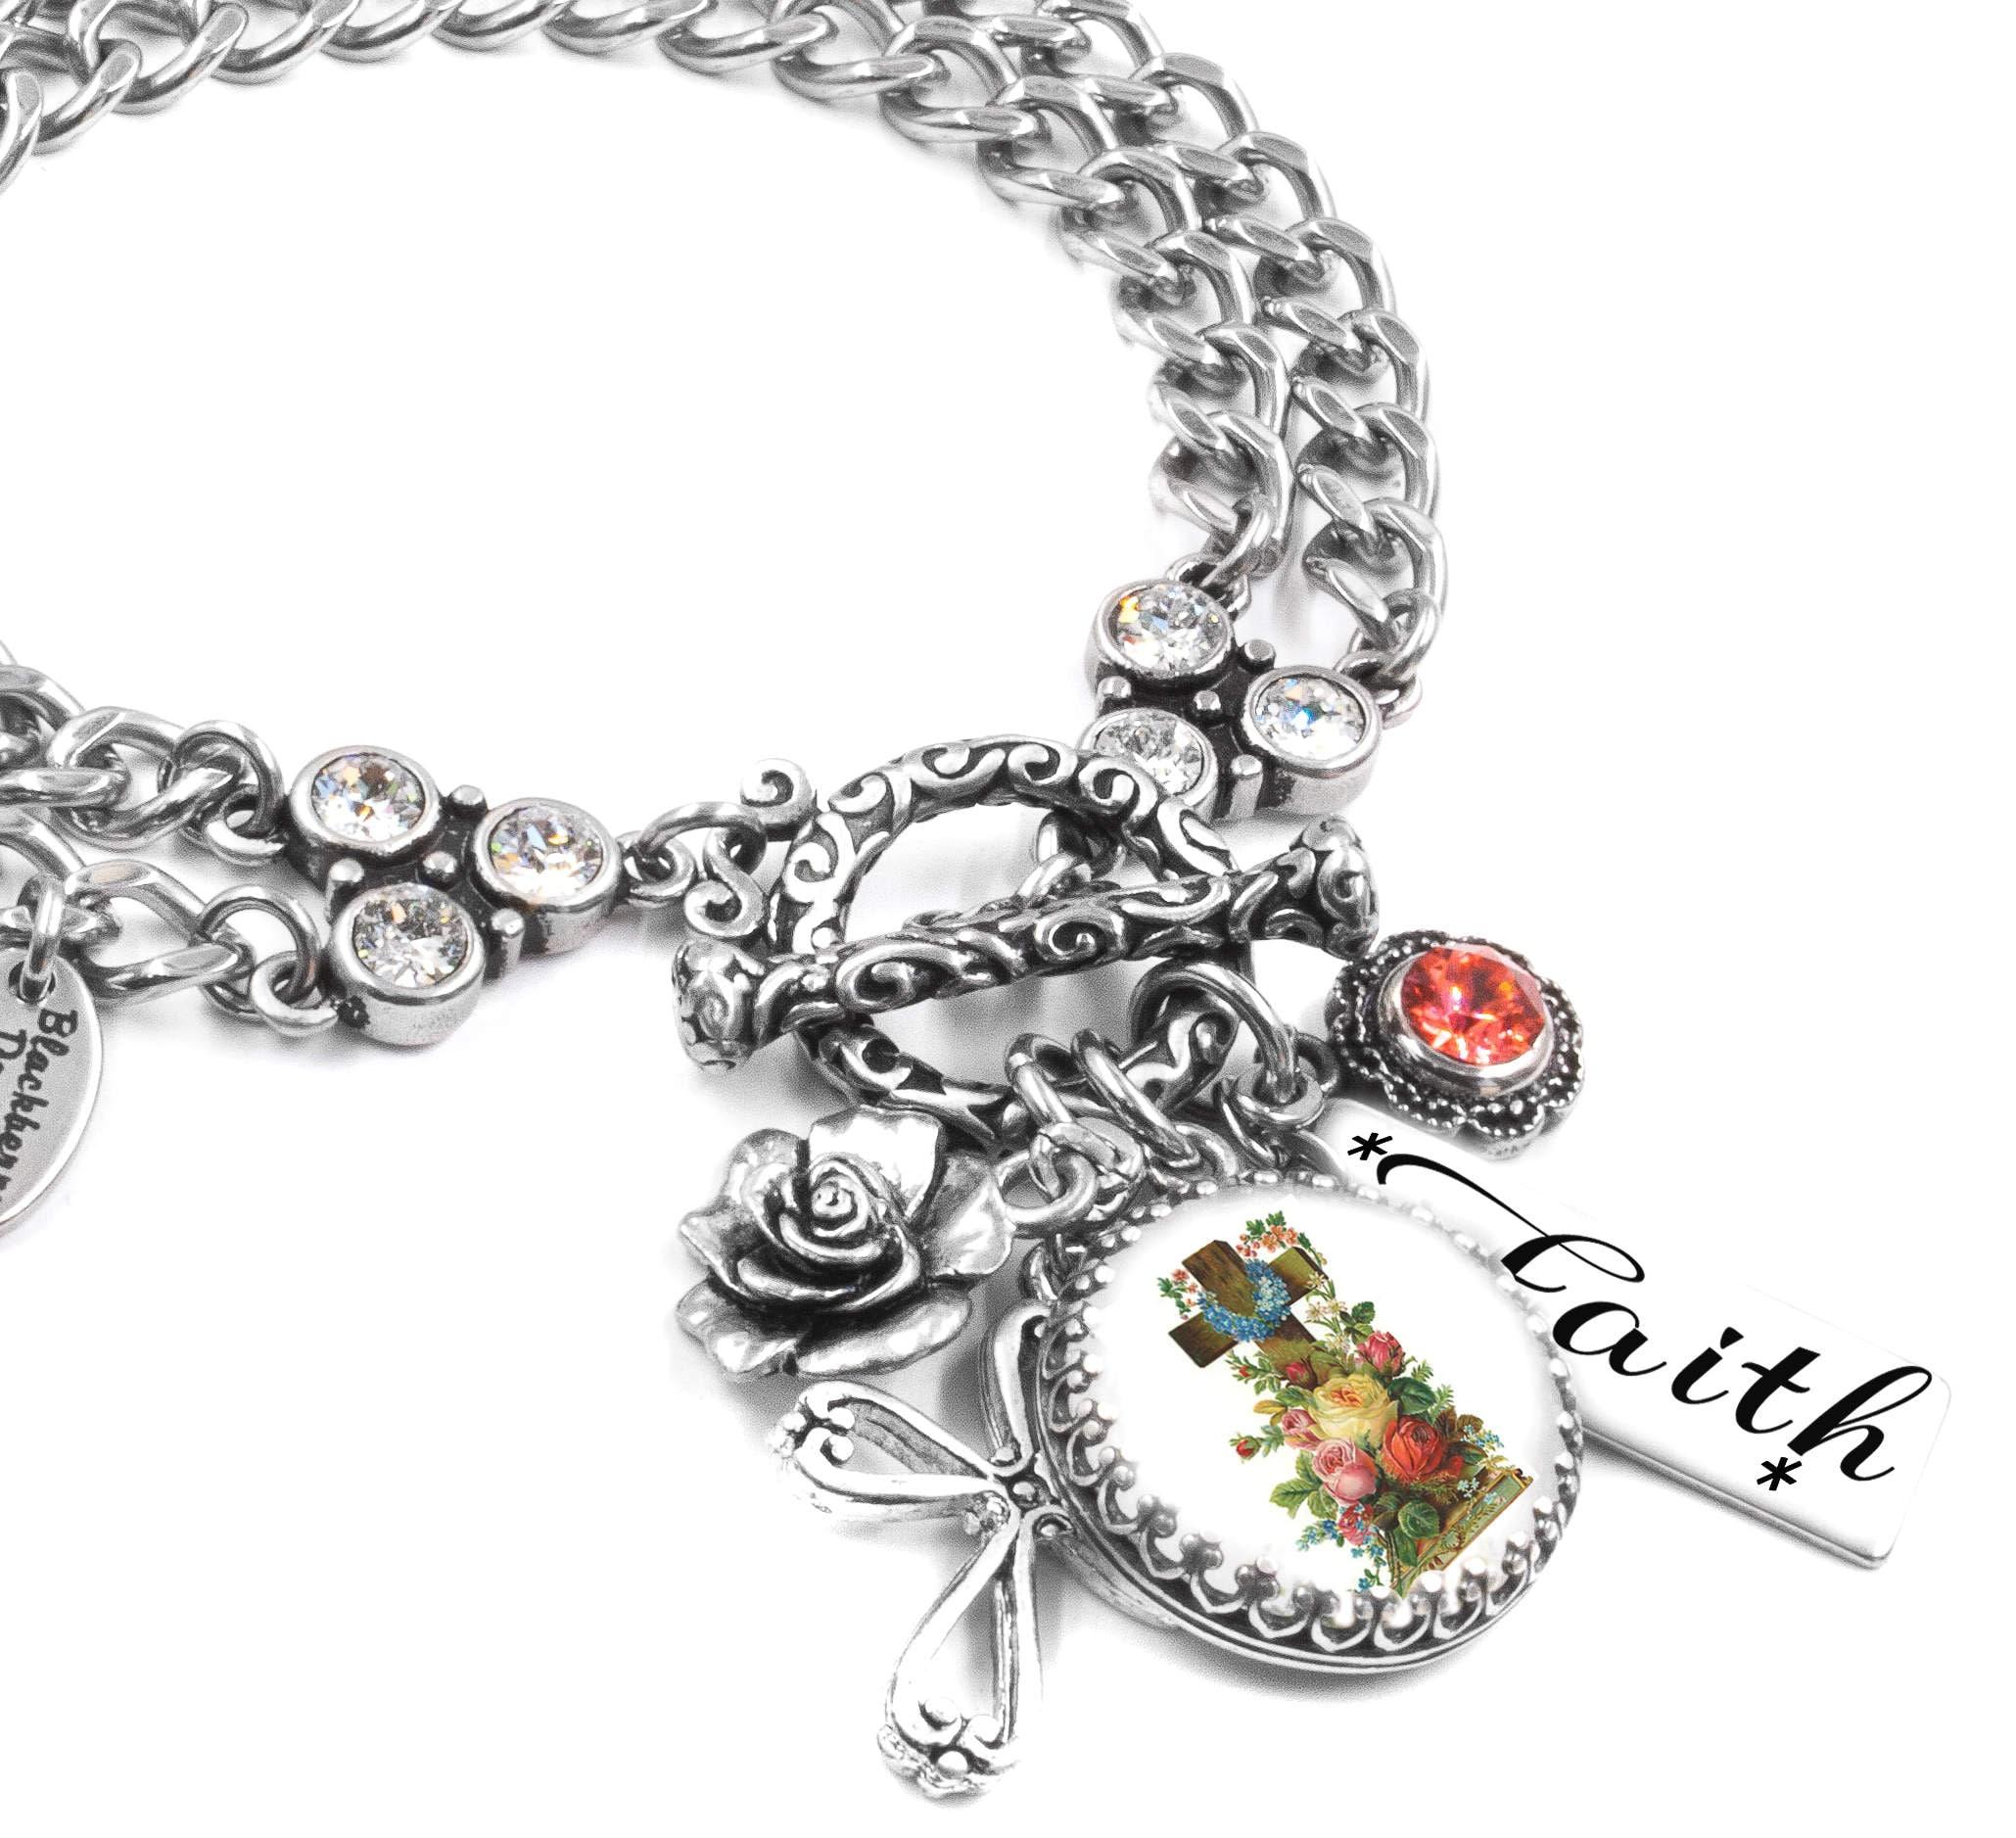 Christian Charm Bracelets: Cross Bracelet Christian Jewelry Faith Bracelet Religious